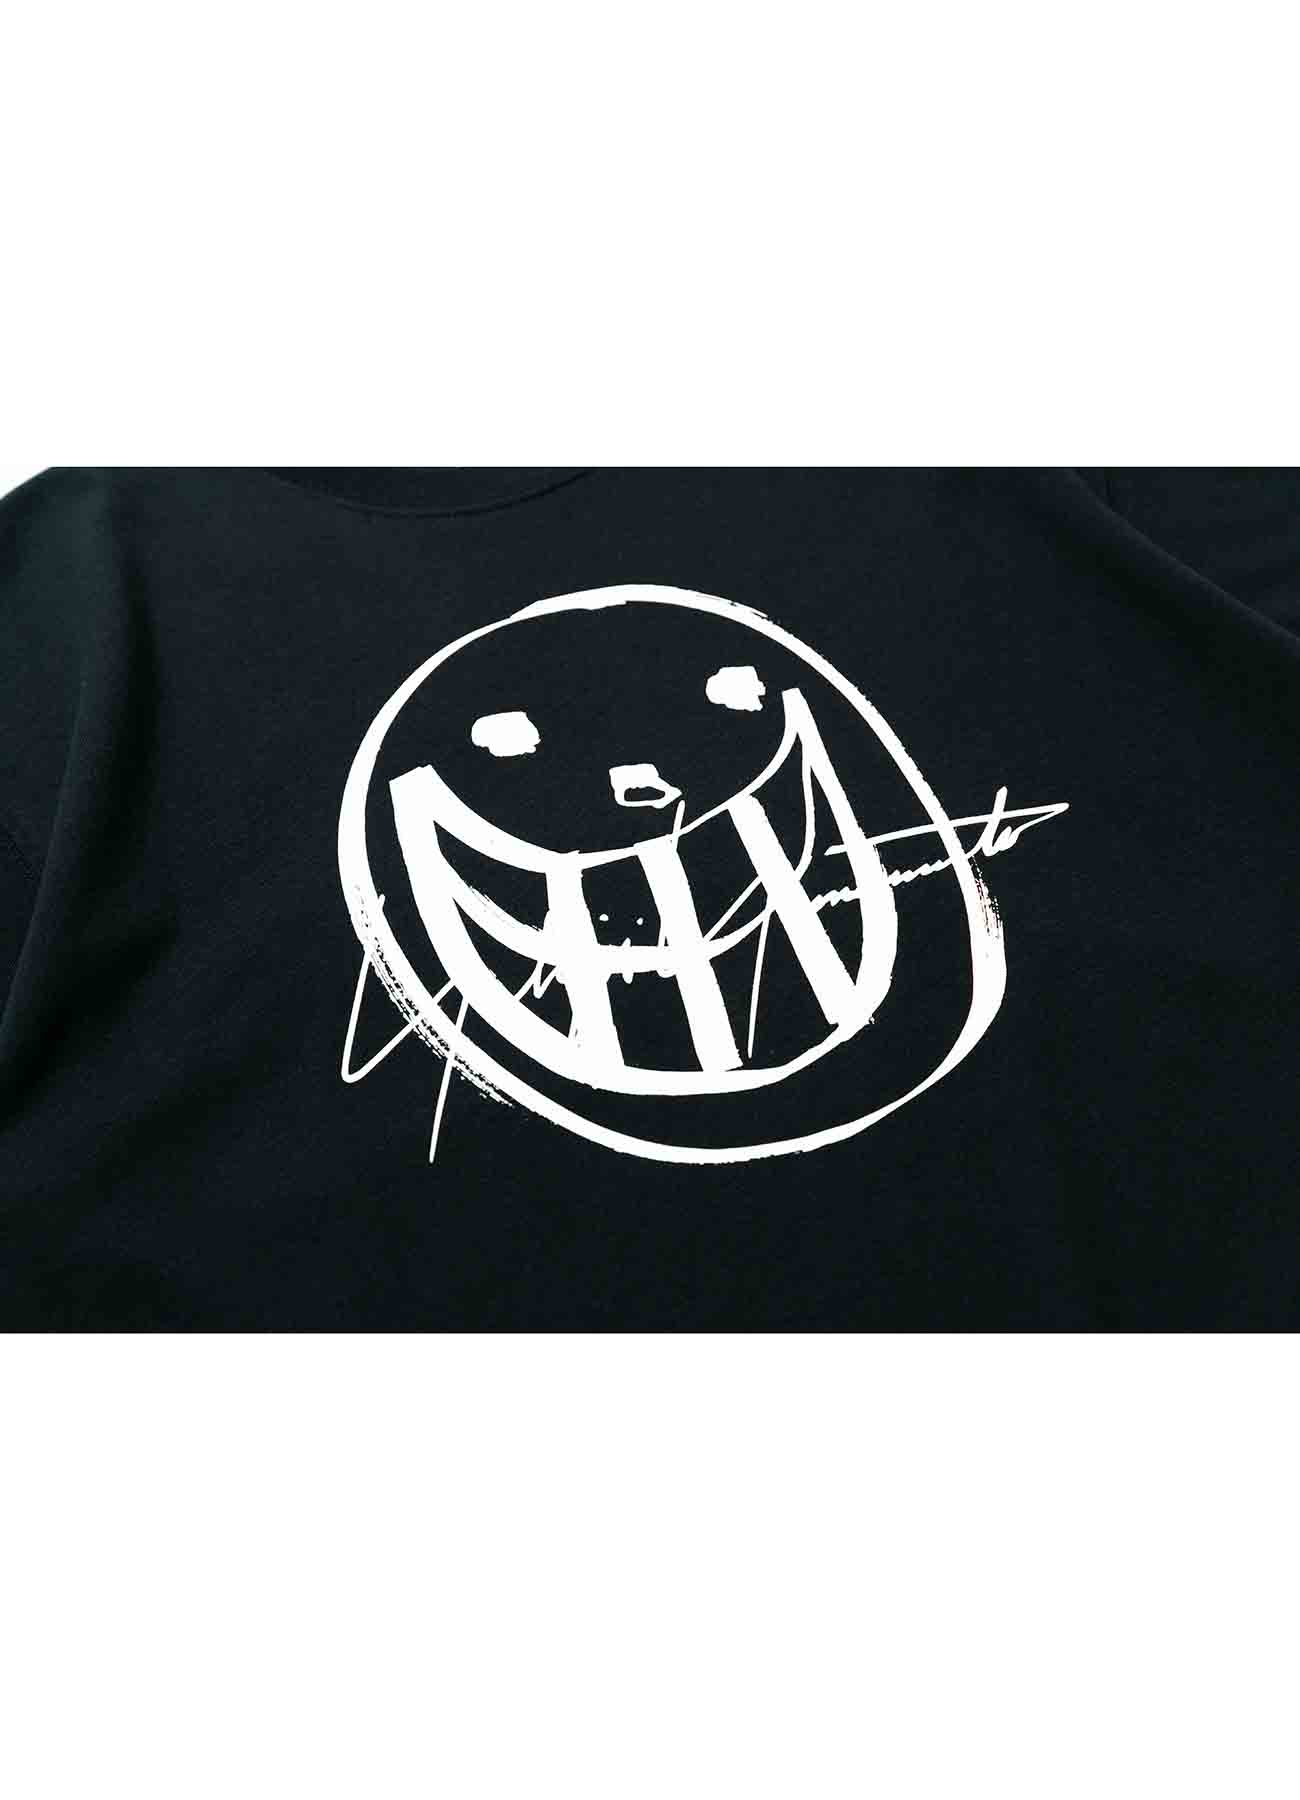 Yohji Yamamoto × New Era S/S SMILE LOGO PRINT COTTON TEE